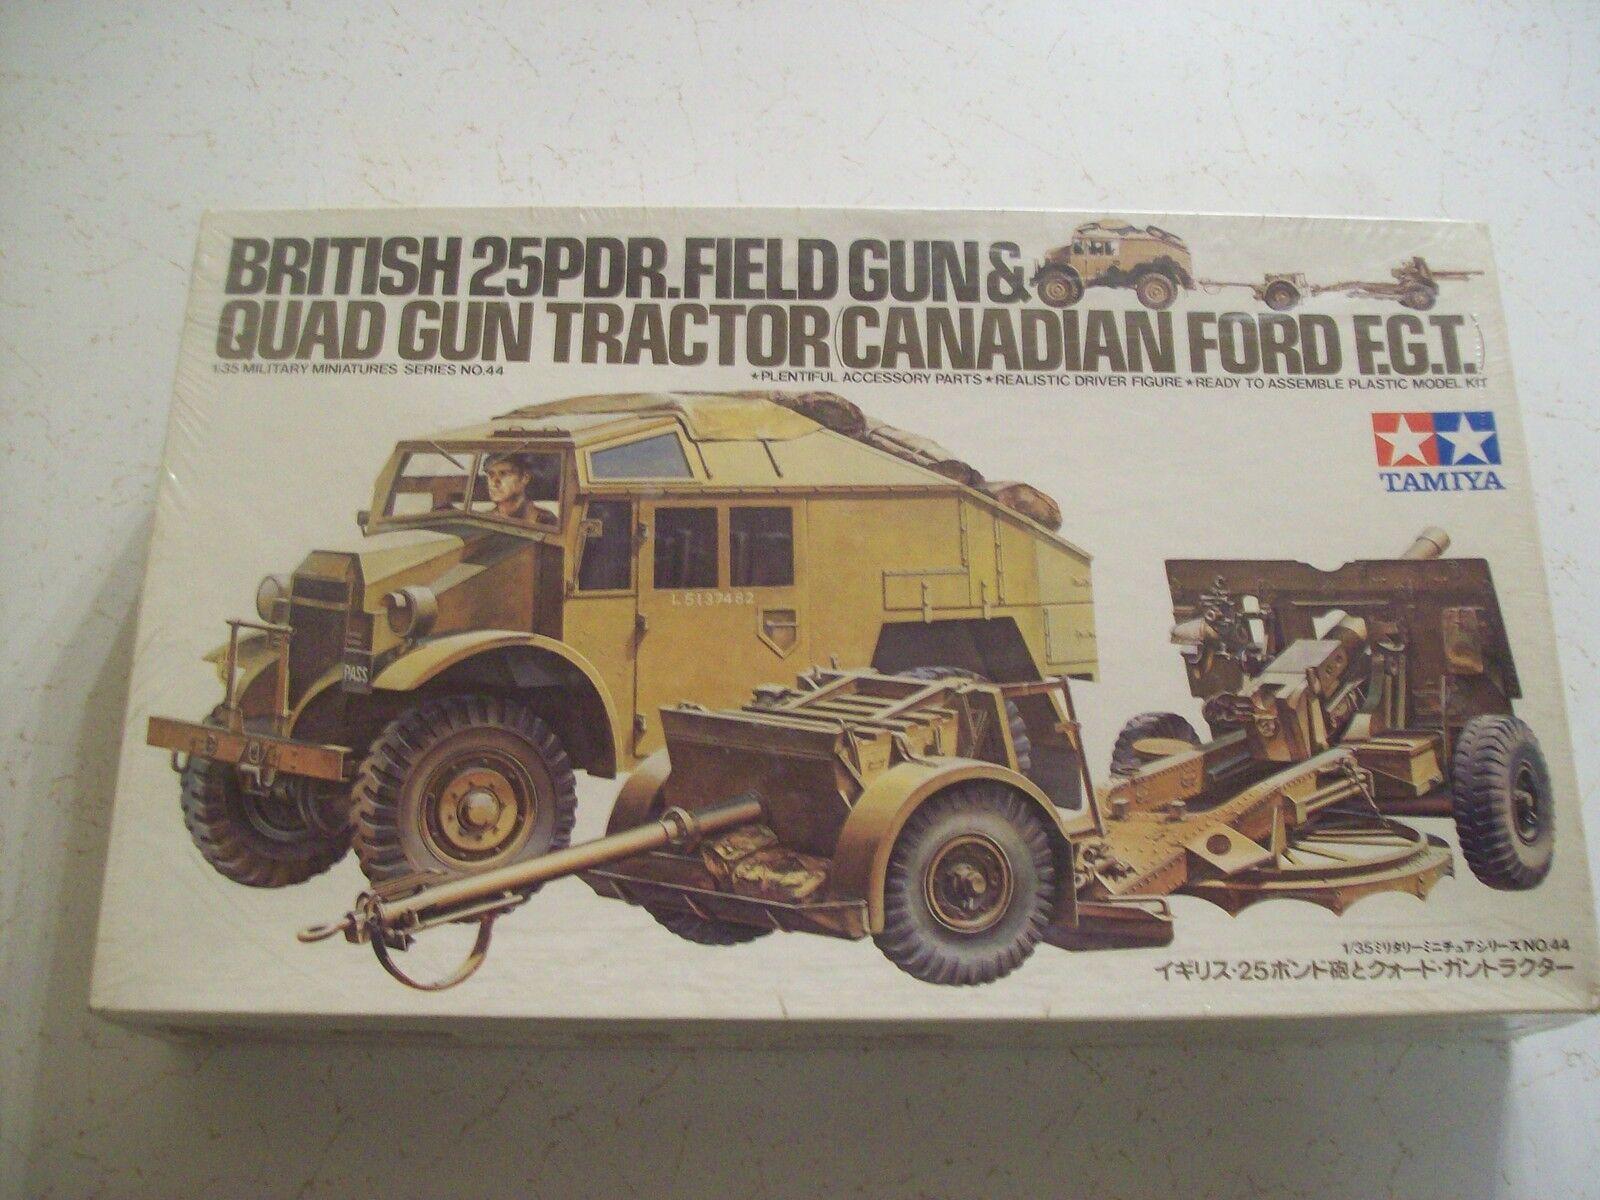 Tamiya 1 35 Model Kit British 25PDR Field & Quad Gun Tractor Canaidan Ford MM144